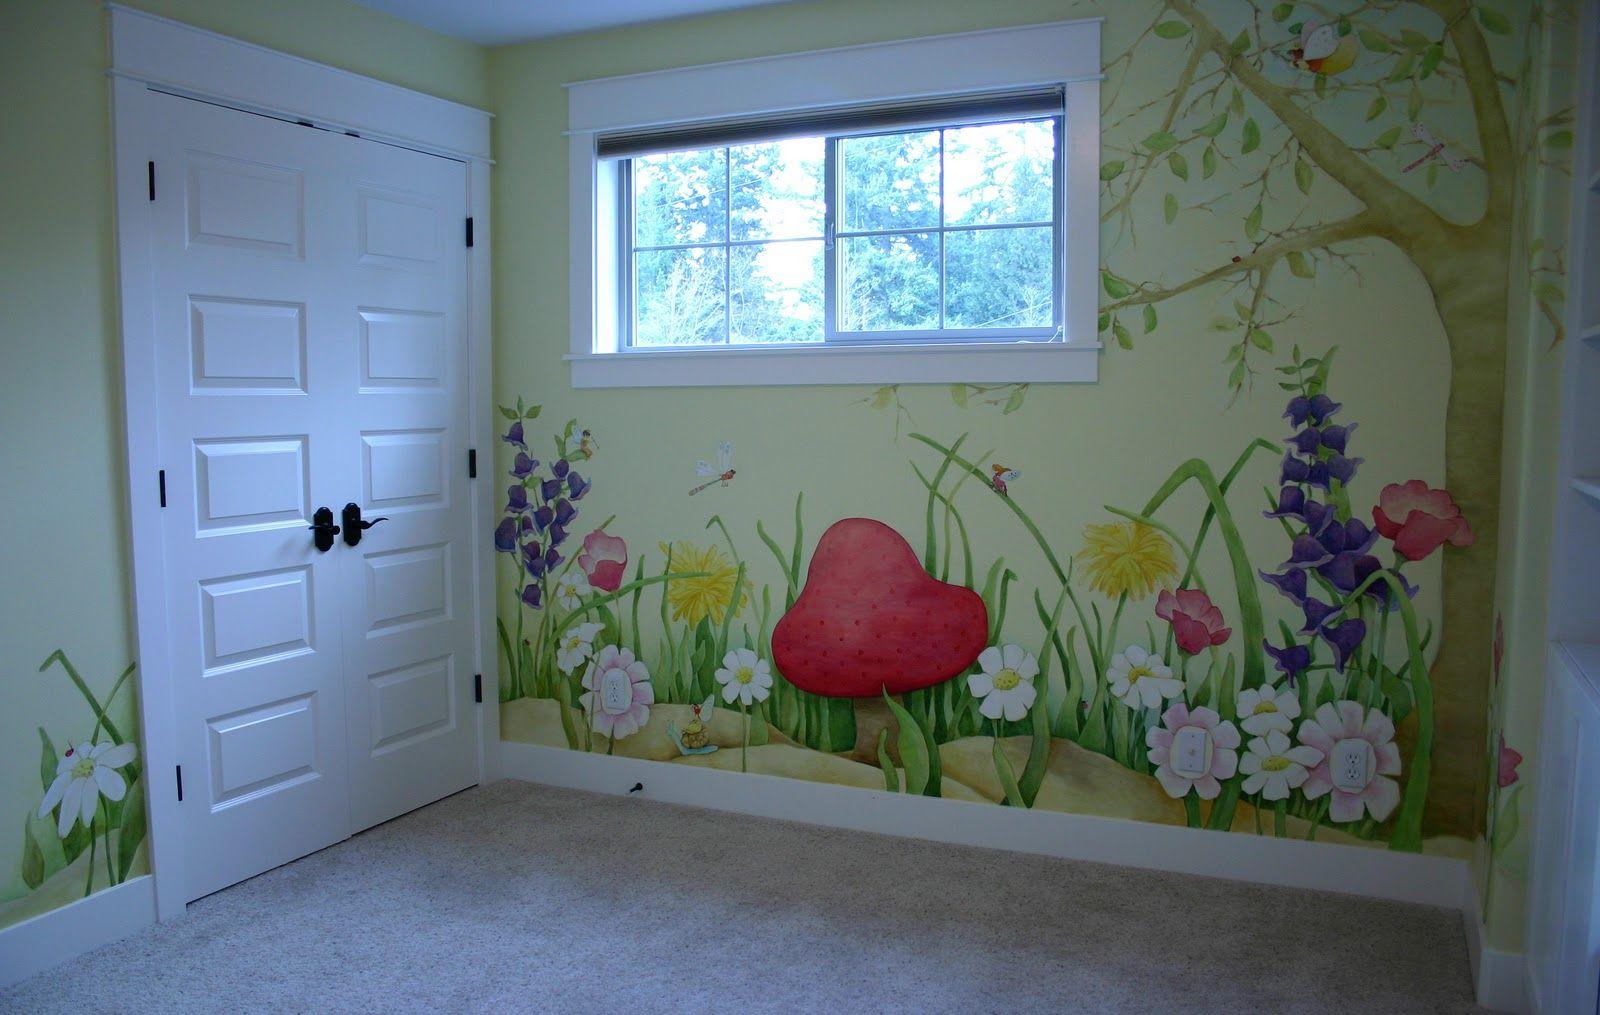 Wall Mural for Children's room